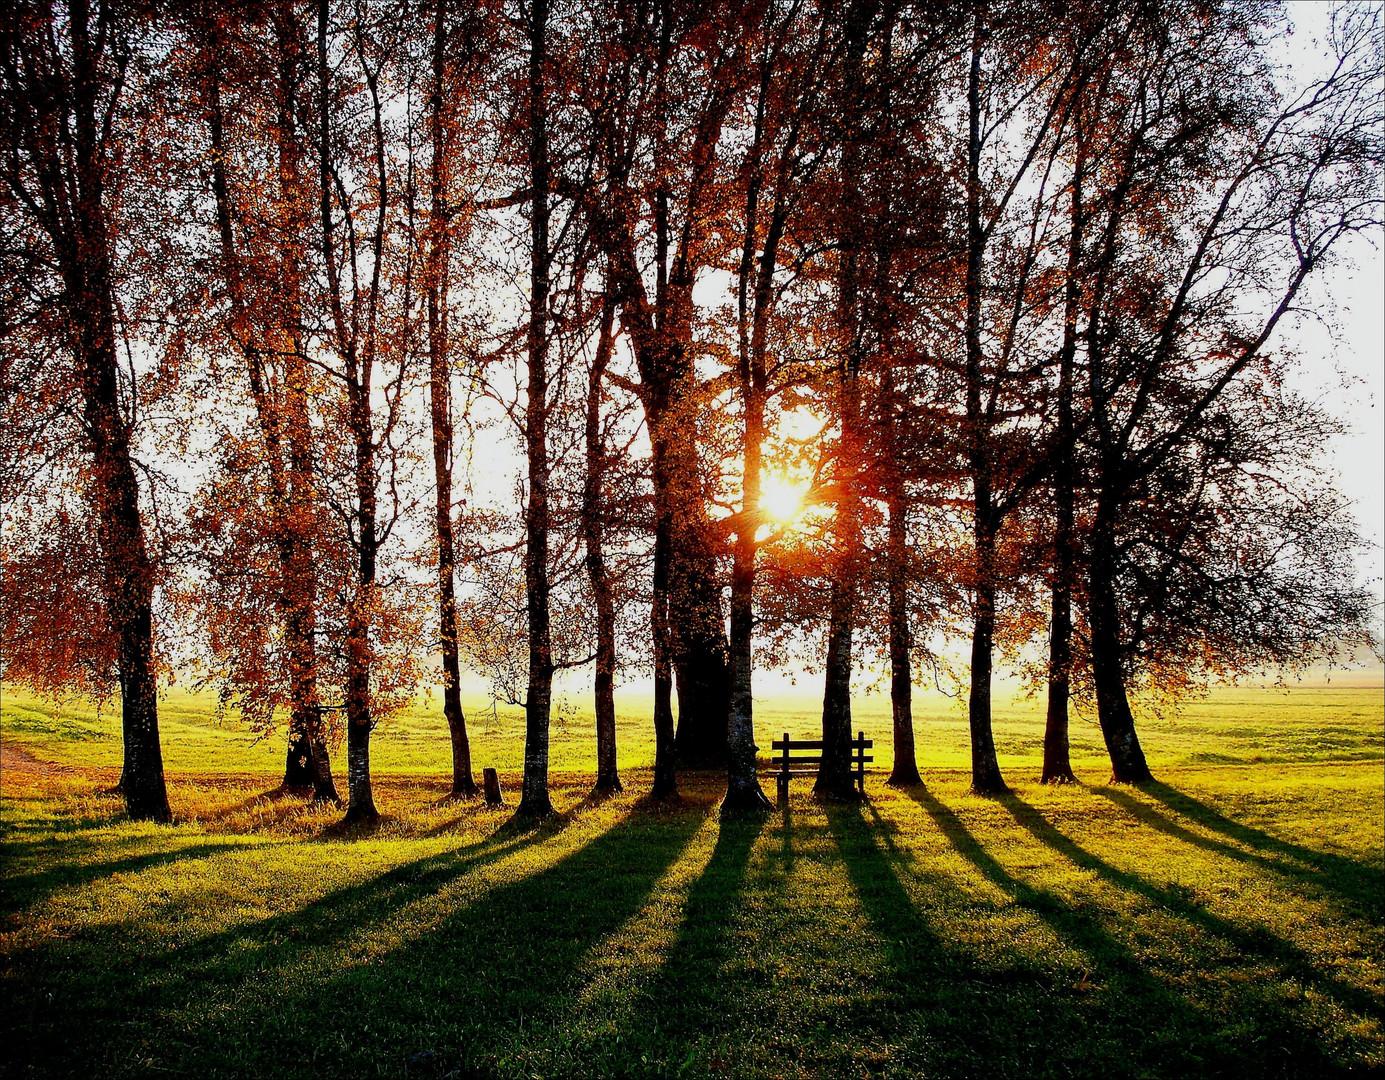 Baumgruppe mit Ruhebank